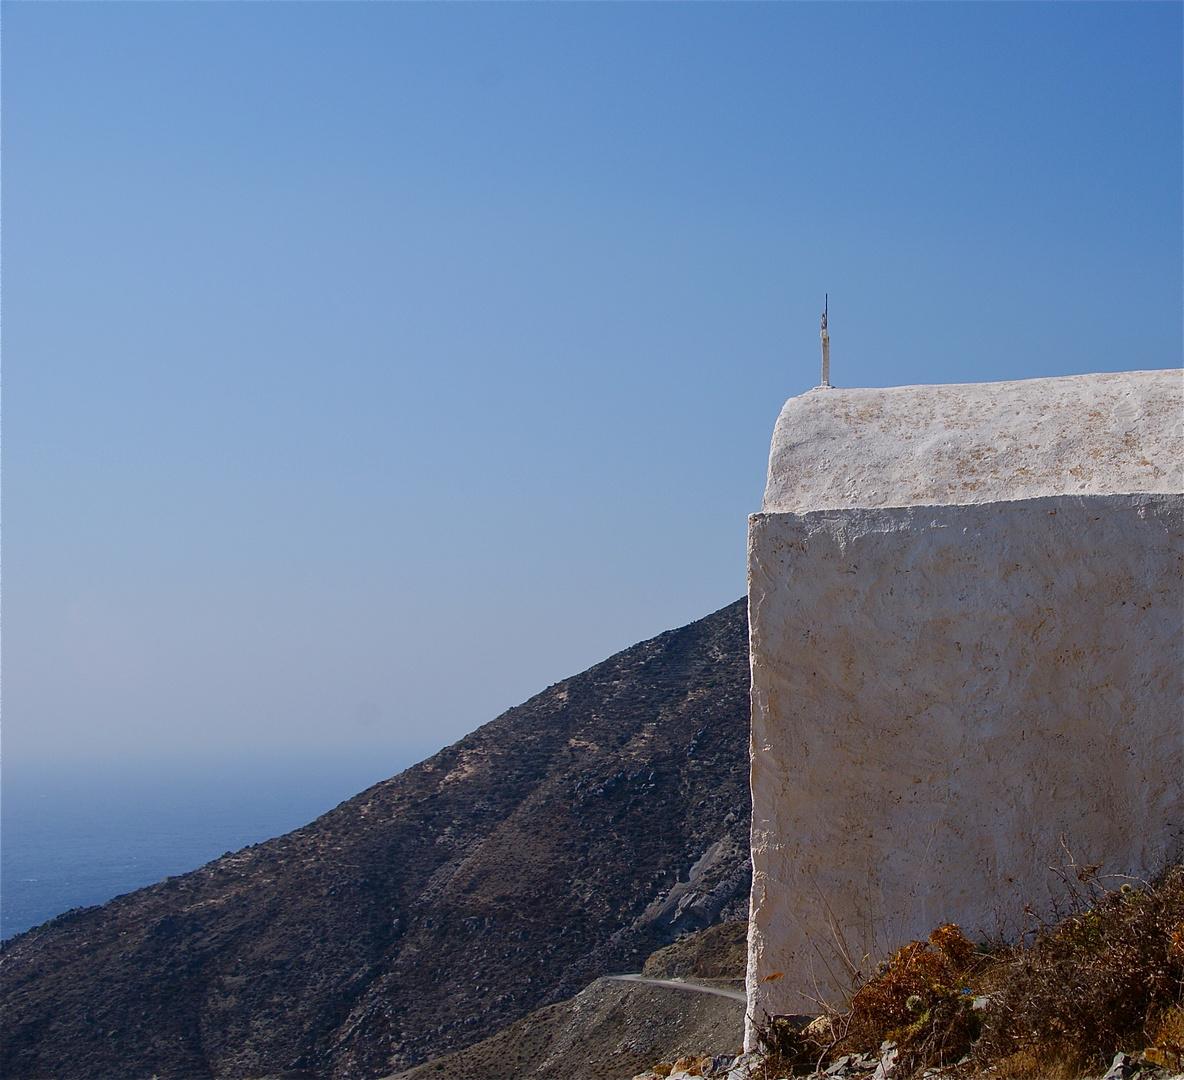 olympos, karpathos greece 2009